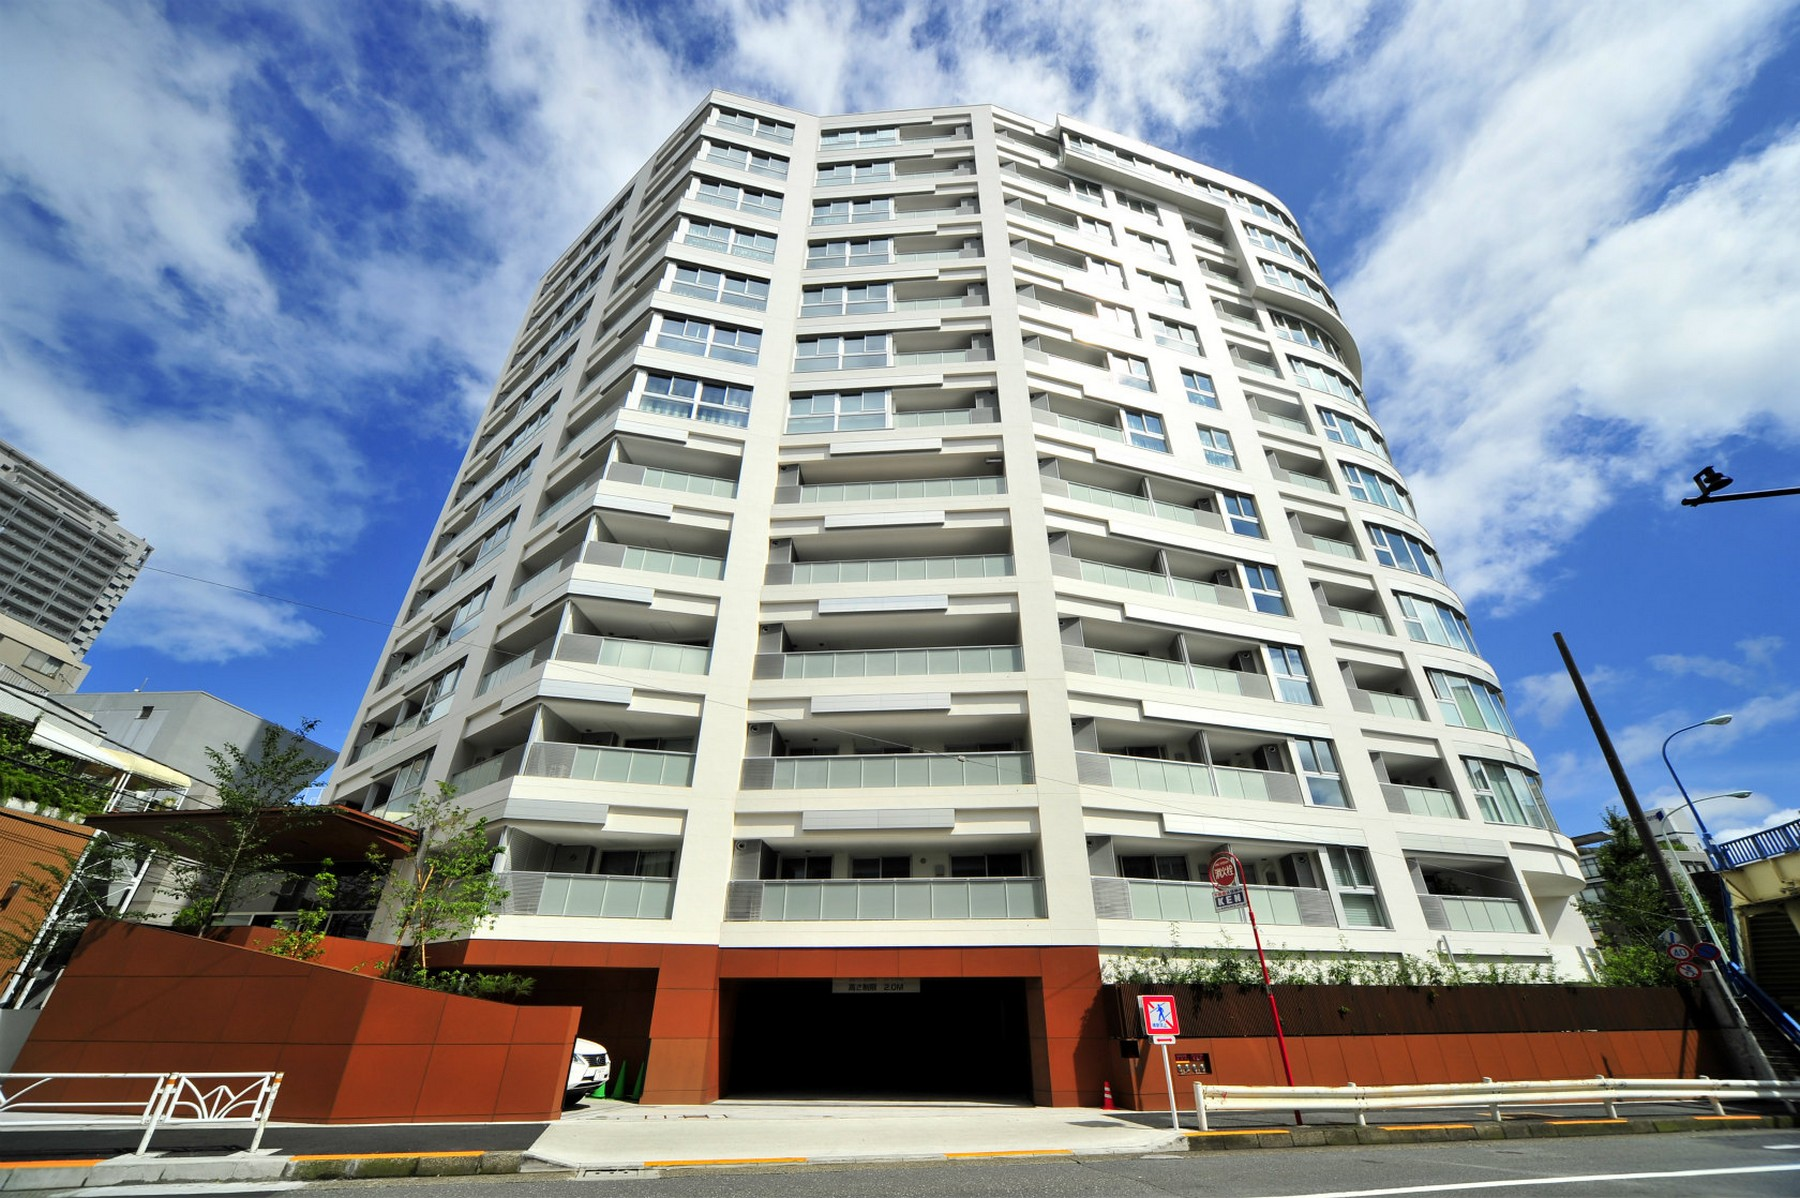 Appartamento per Vendita alle ore The Conoe Daikanyama Hiroo, Shibuya-Ku, Tokyo Giappone